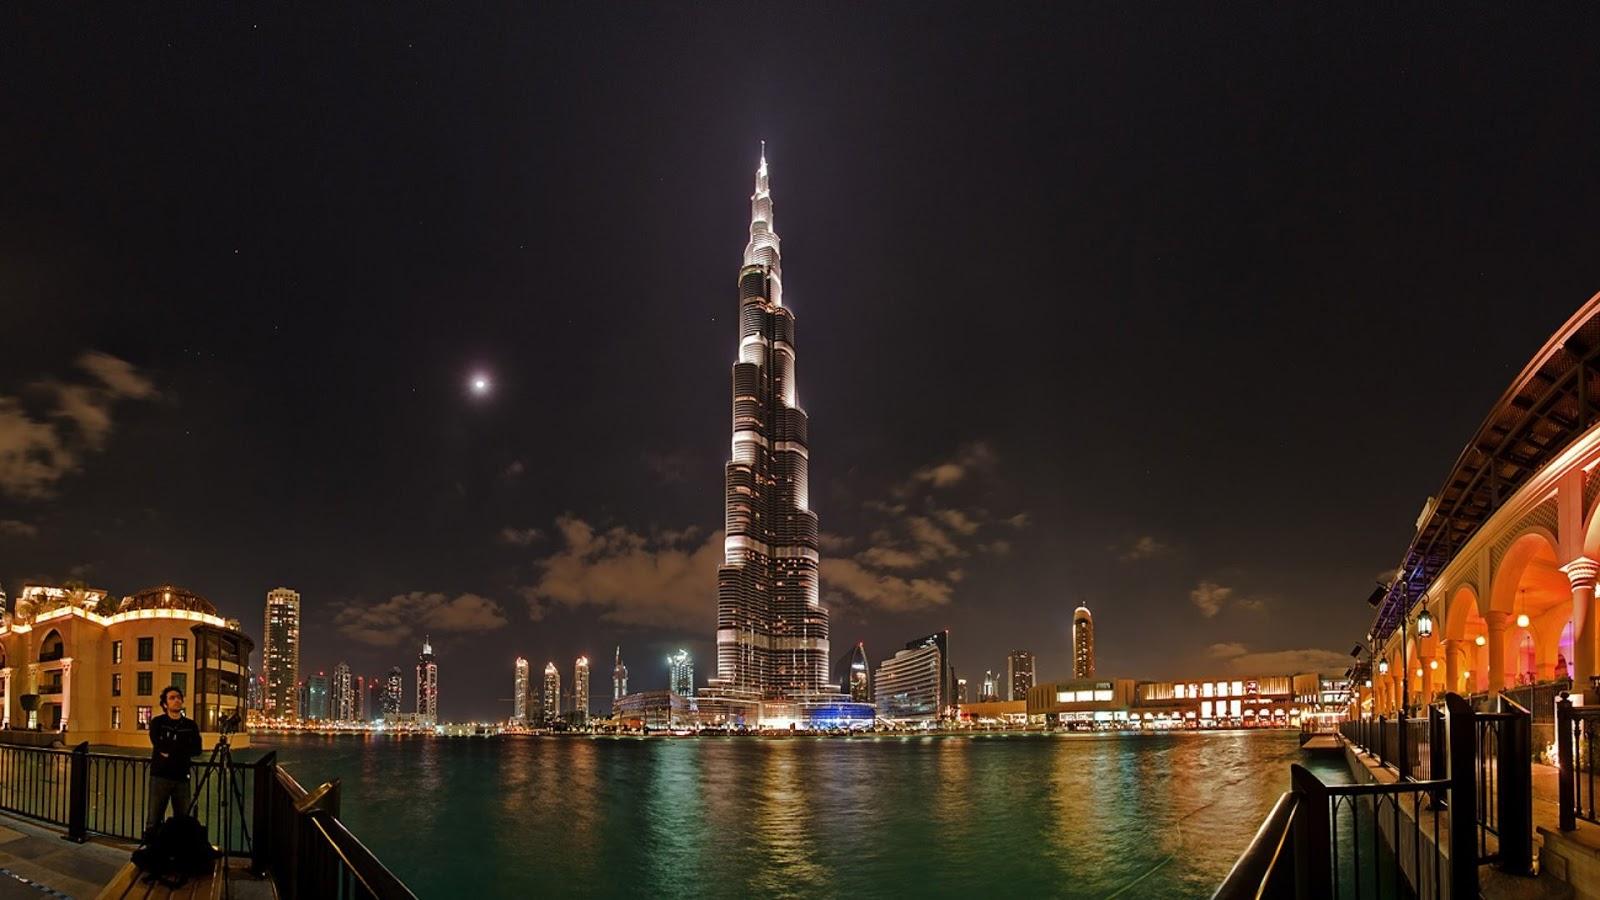 Pic new posts burj khalifa 1080p wallpapers - Dubai burj khalifa hd wallpaper ...